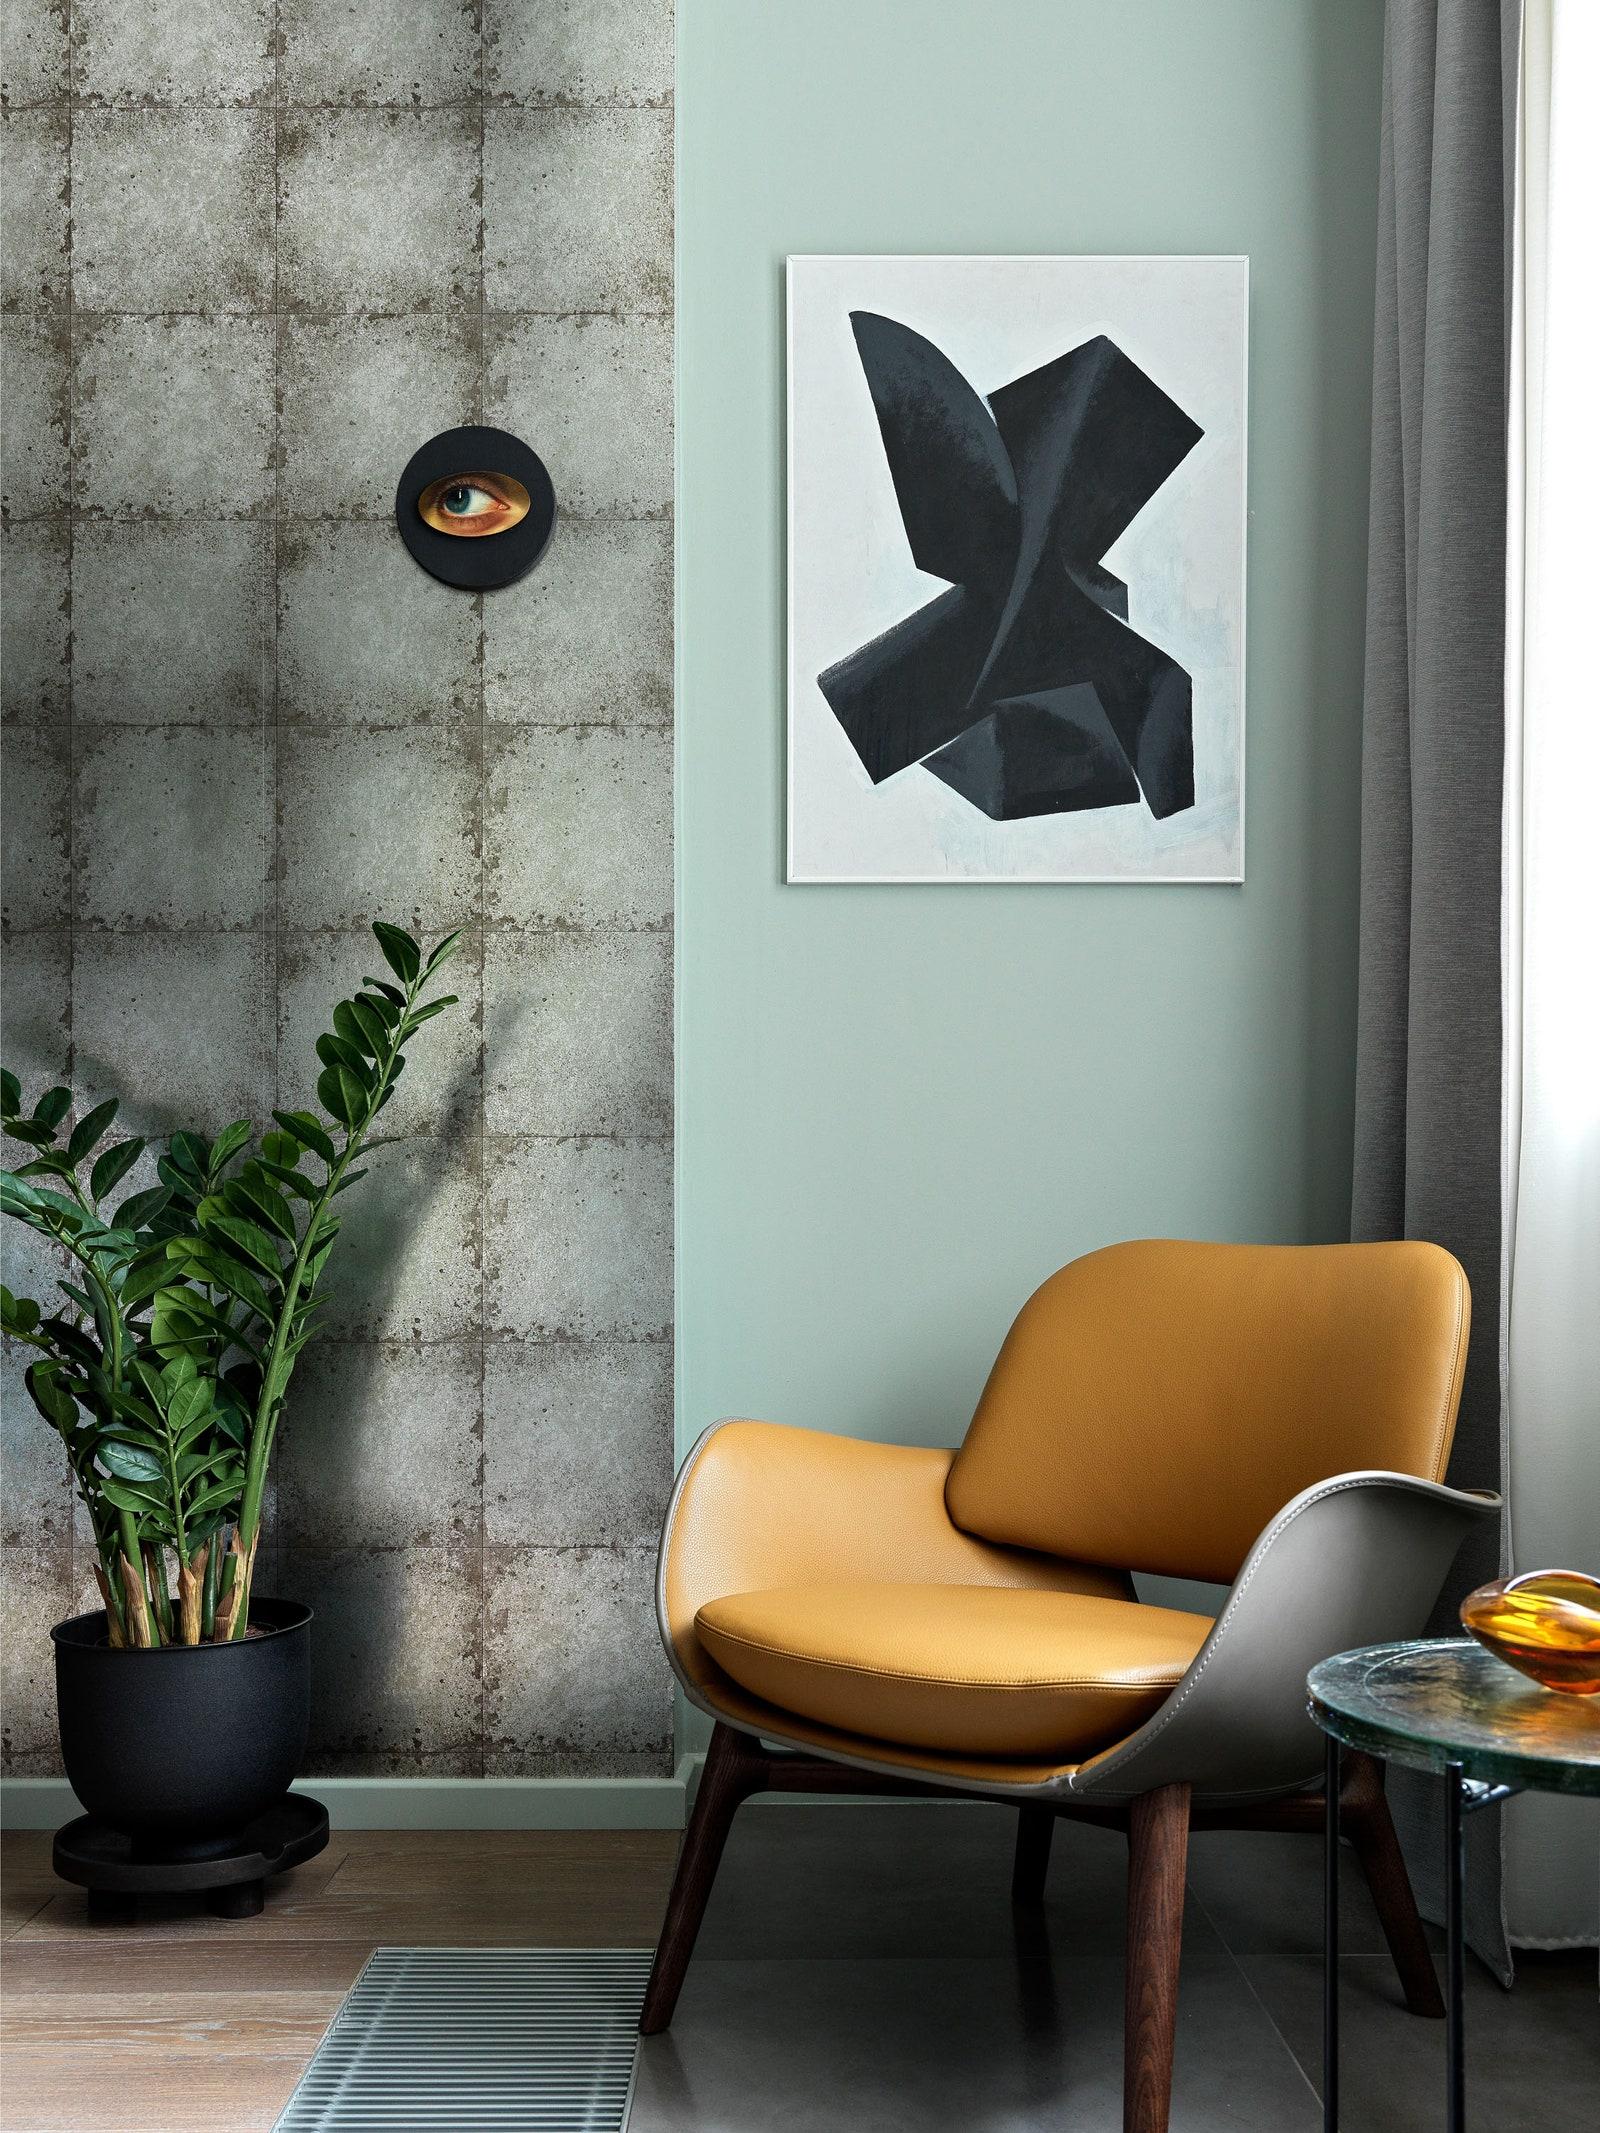 .  Poltrona Frau    Zara Home           Art Brut Moscow  Barcelona Design  Zoffany.